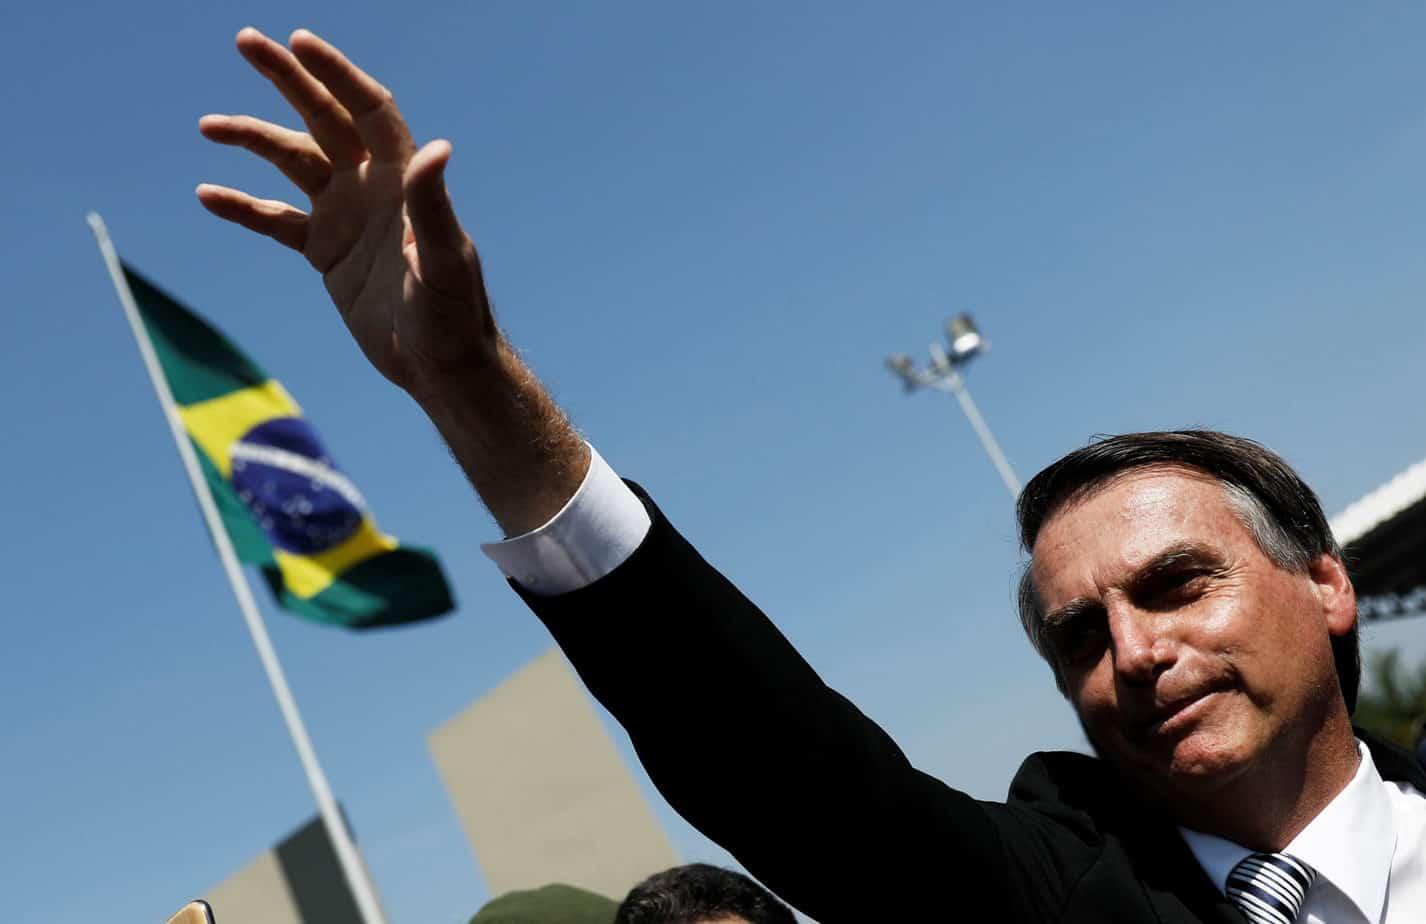 Brasile, exploit dell'estremista di destra Bolsonaro